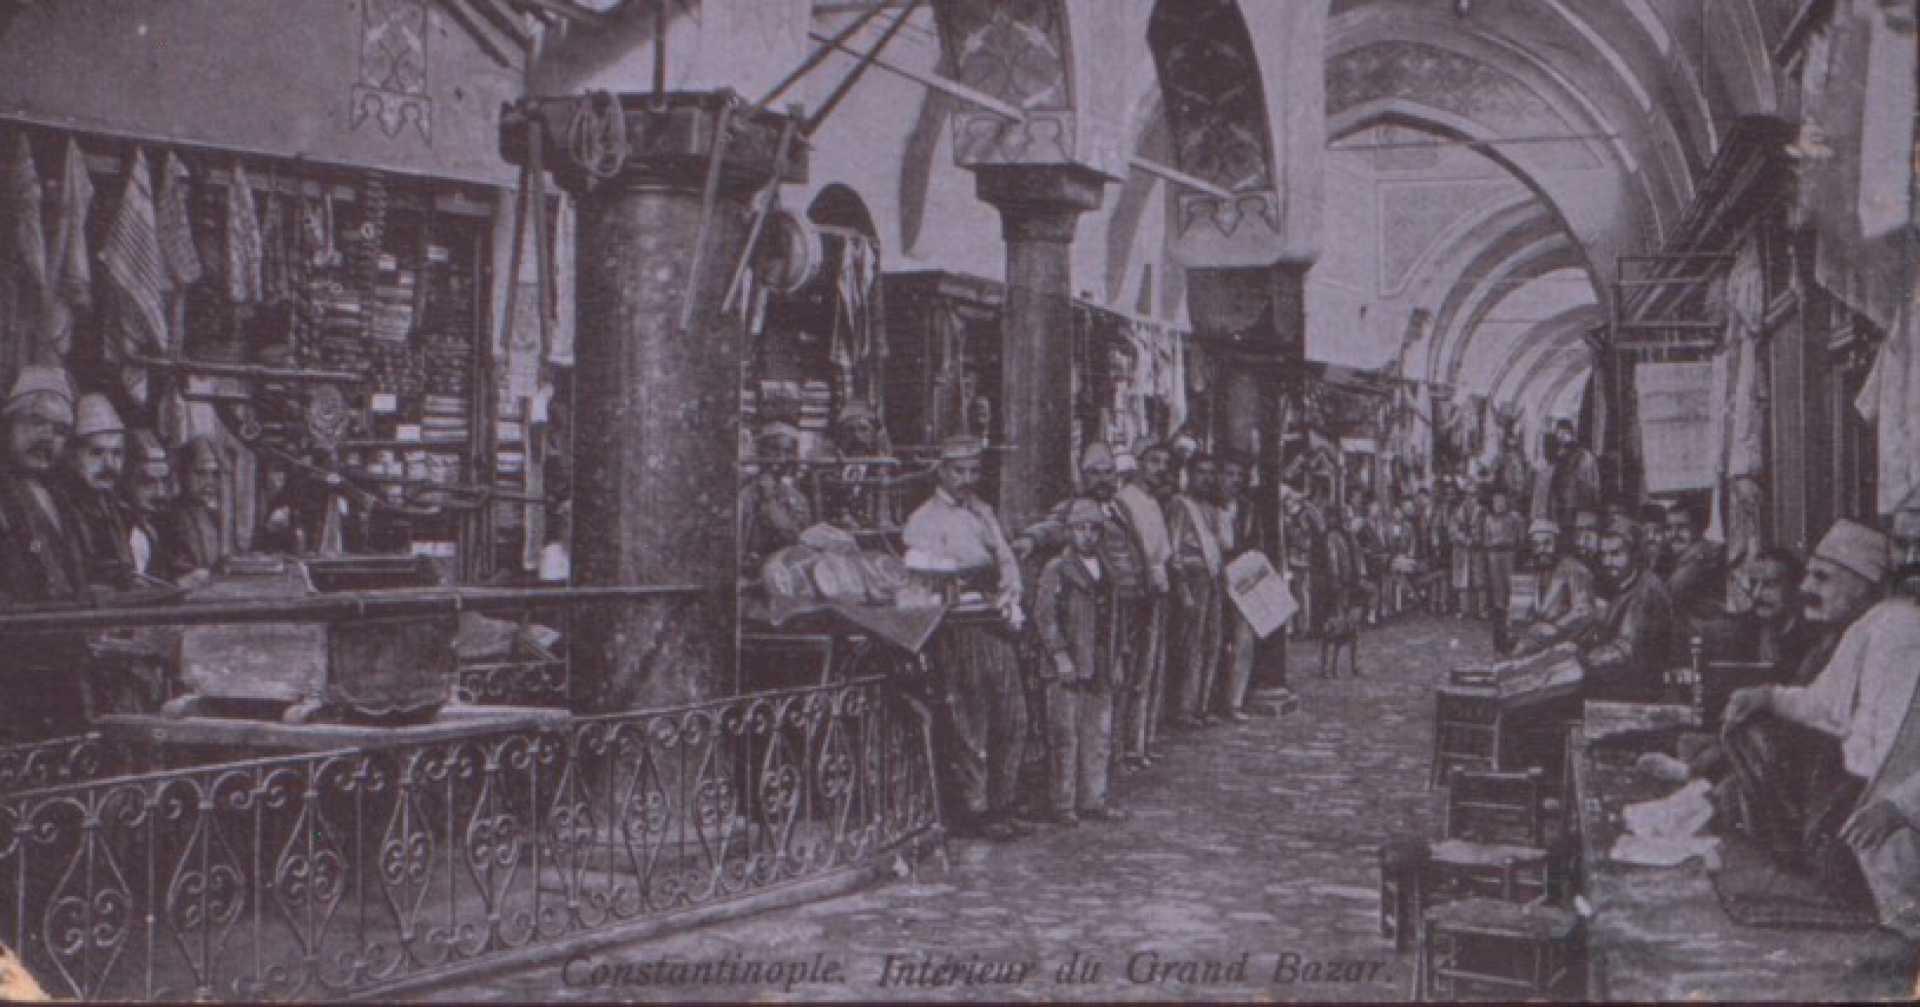 Interieur du Grand Bazar